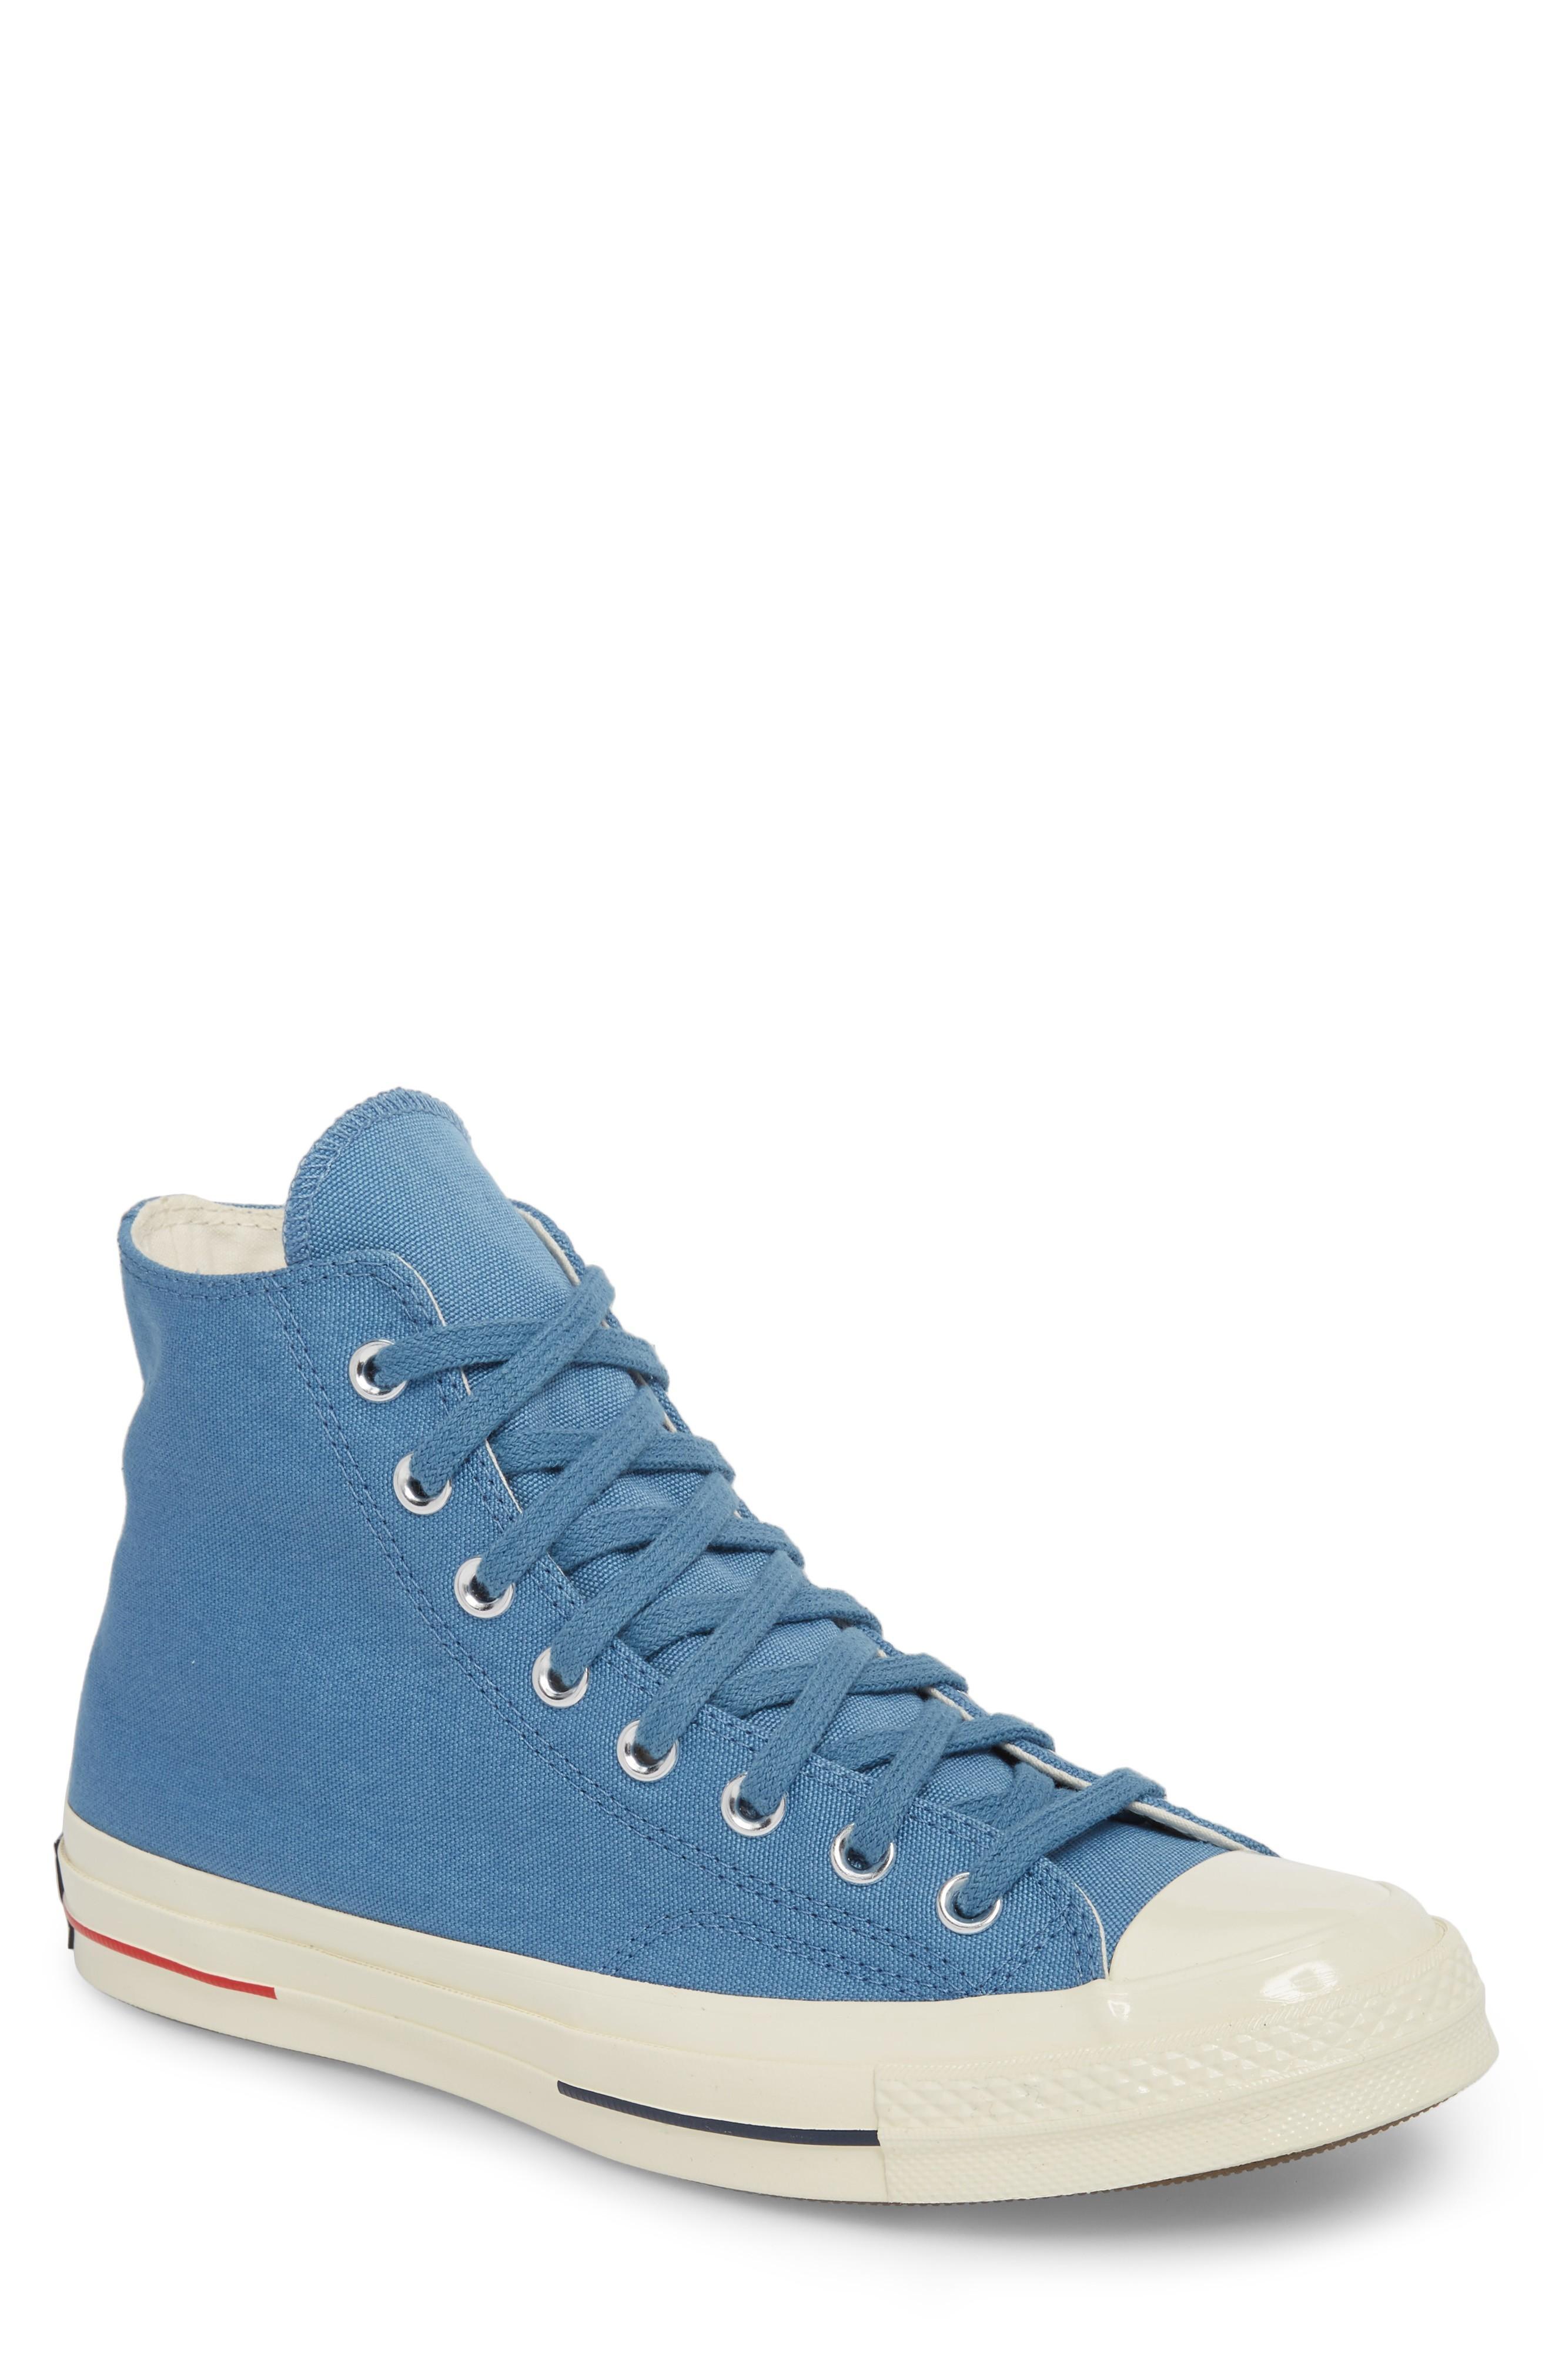 e1d2b28d0b Converse Chuck Taylor All Star '70S Heritage High Top Sneaker In Aegean  Storm